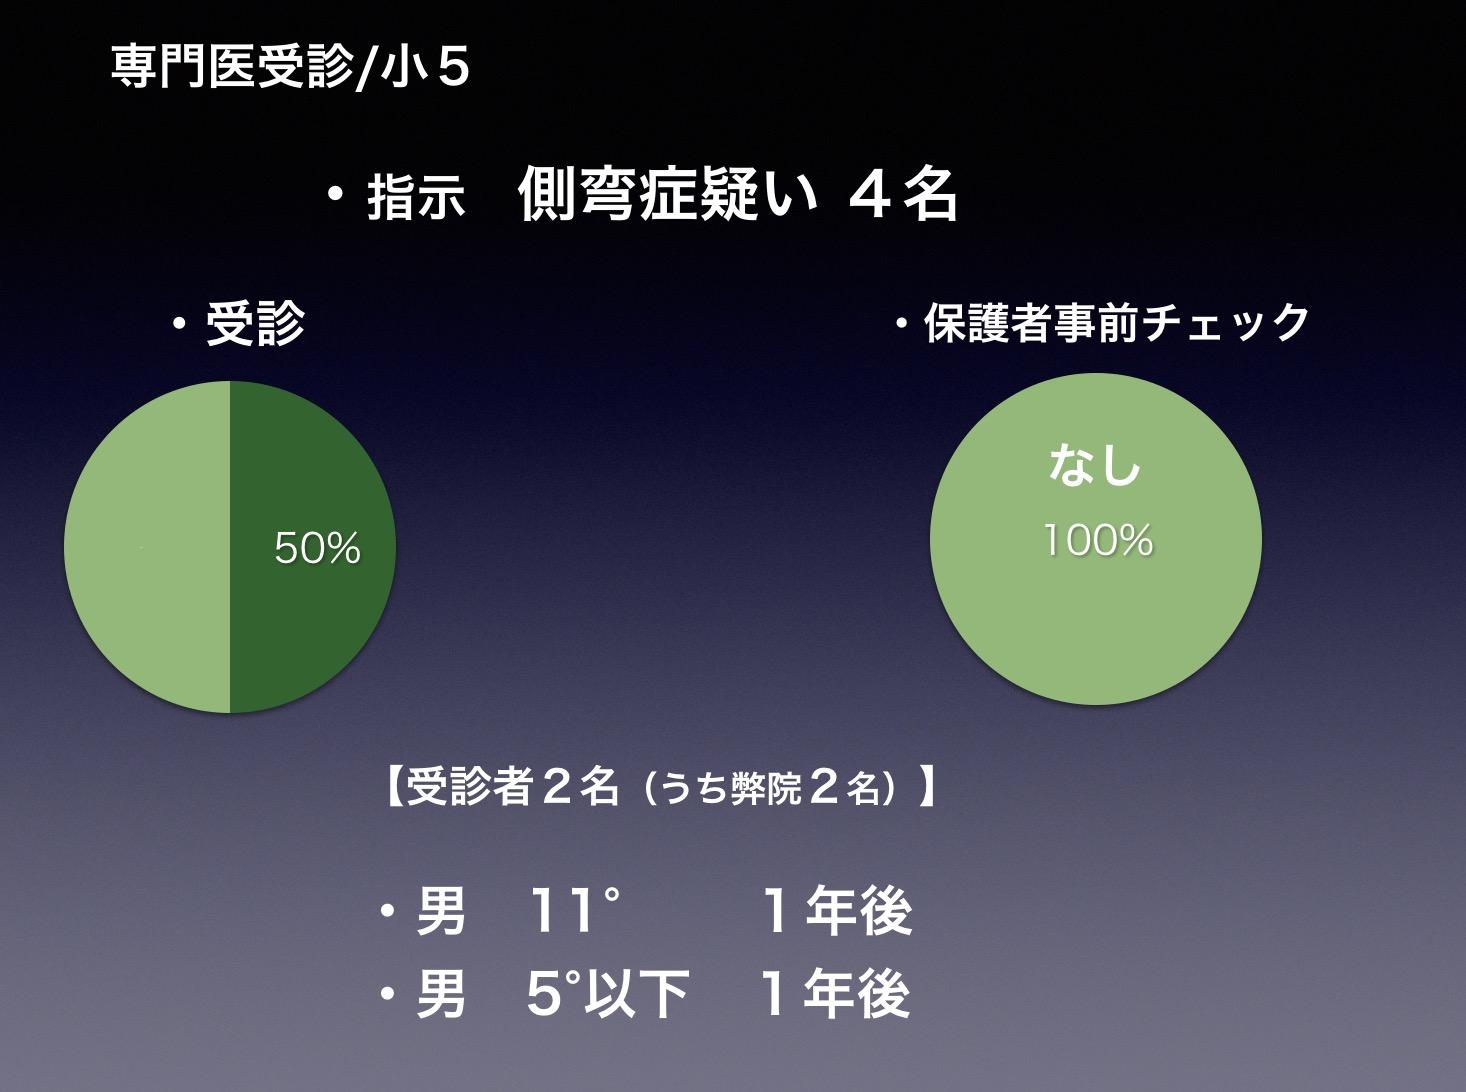 %e3%82%b9%e3%82%af%e3%83%aa%e3%83%bc%e3%83%b3%e3%82%b7%e3%83%a7%e3%83%83%e3%83%88-2016-09-08-9-53-33